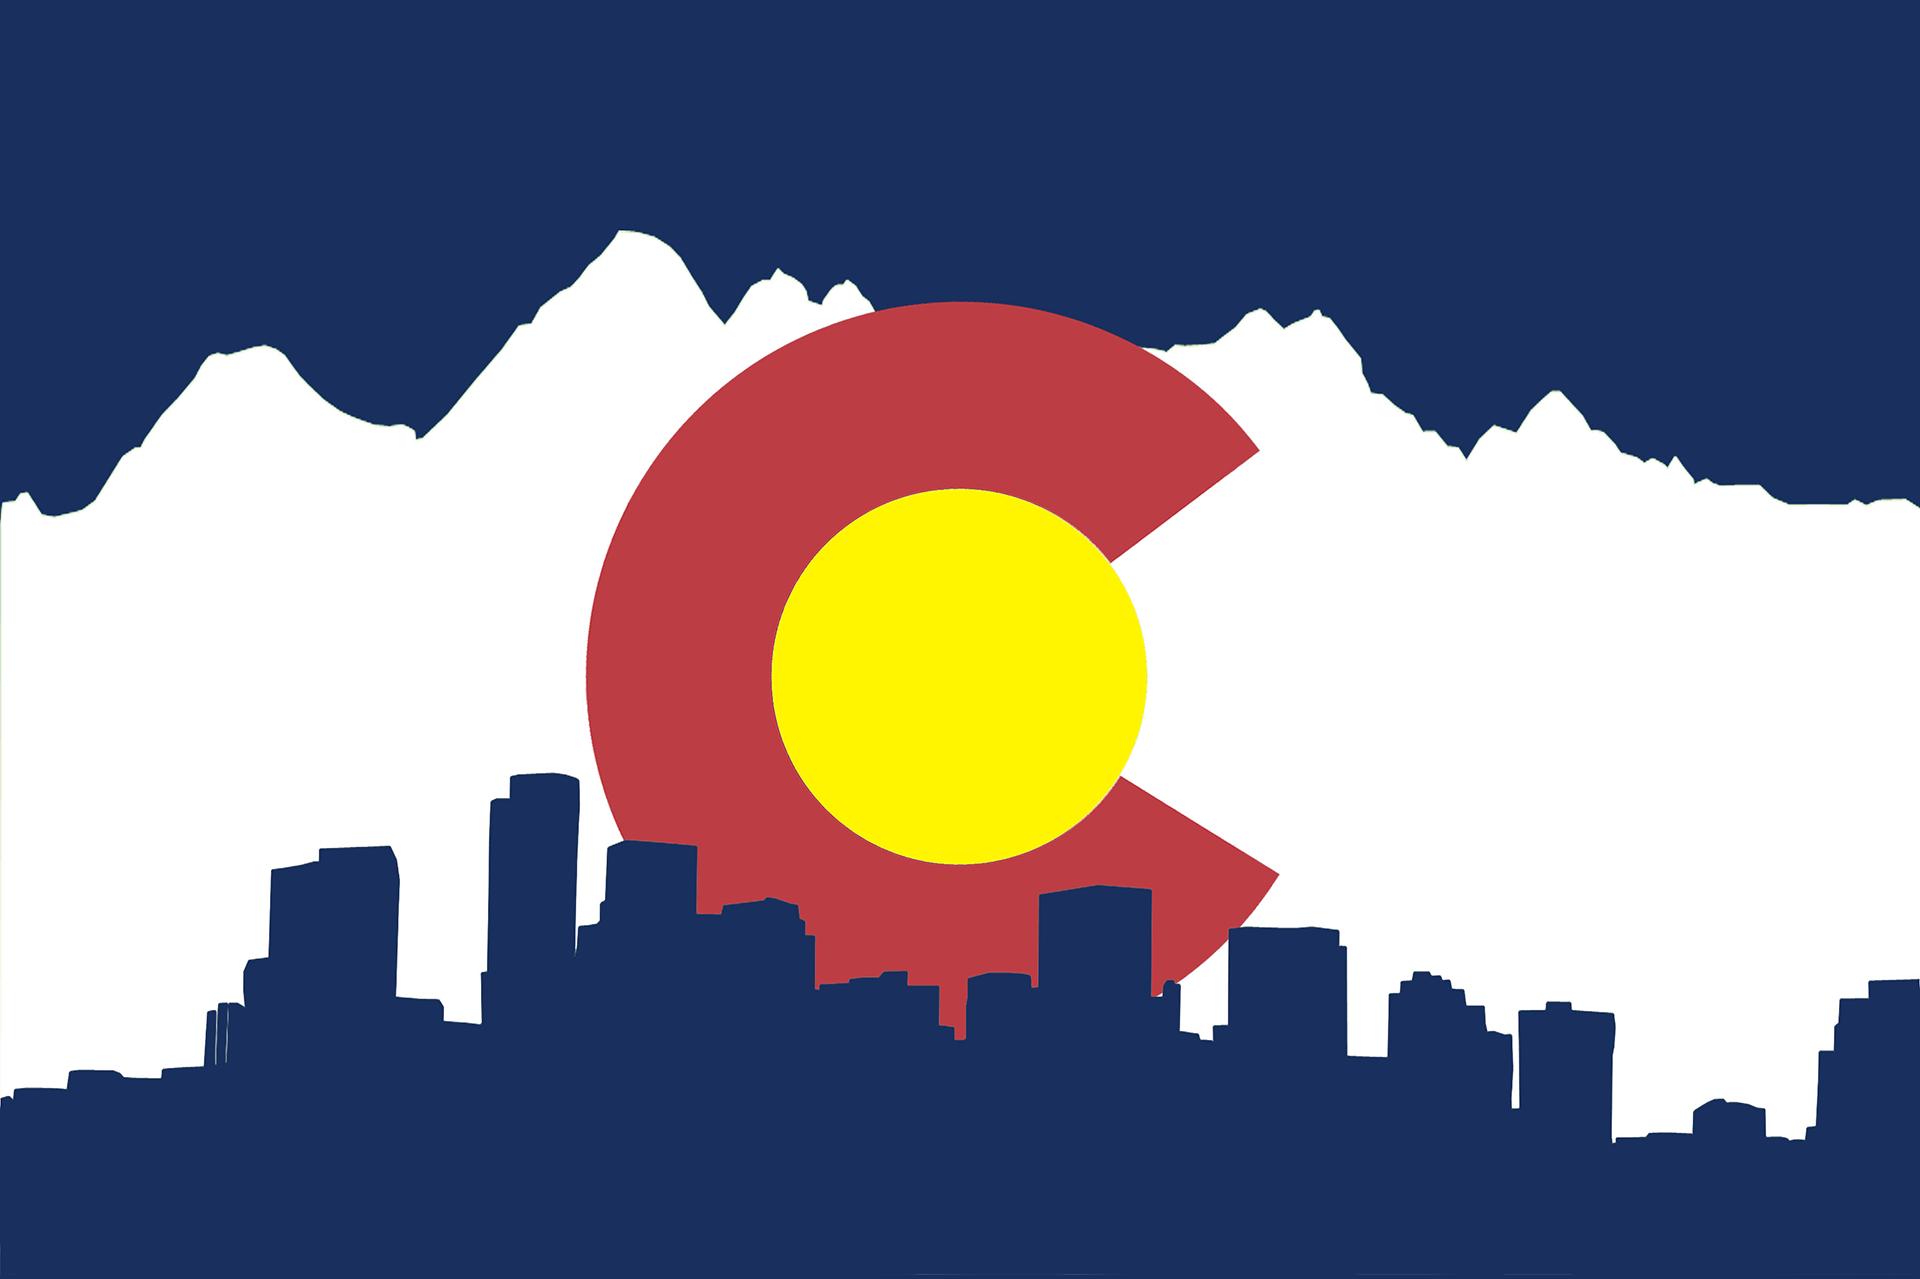 Colorado Flag Computer Wallpapers Desktop Backgrounds 1920x1279 1920x1279